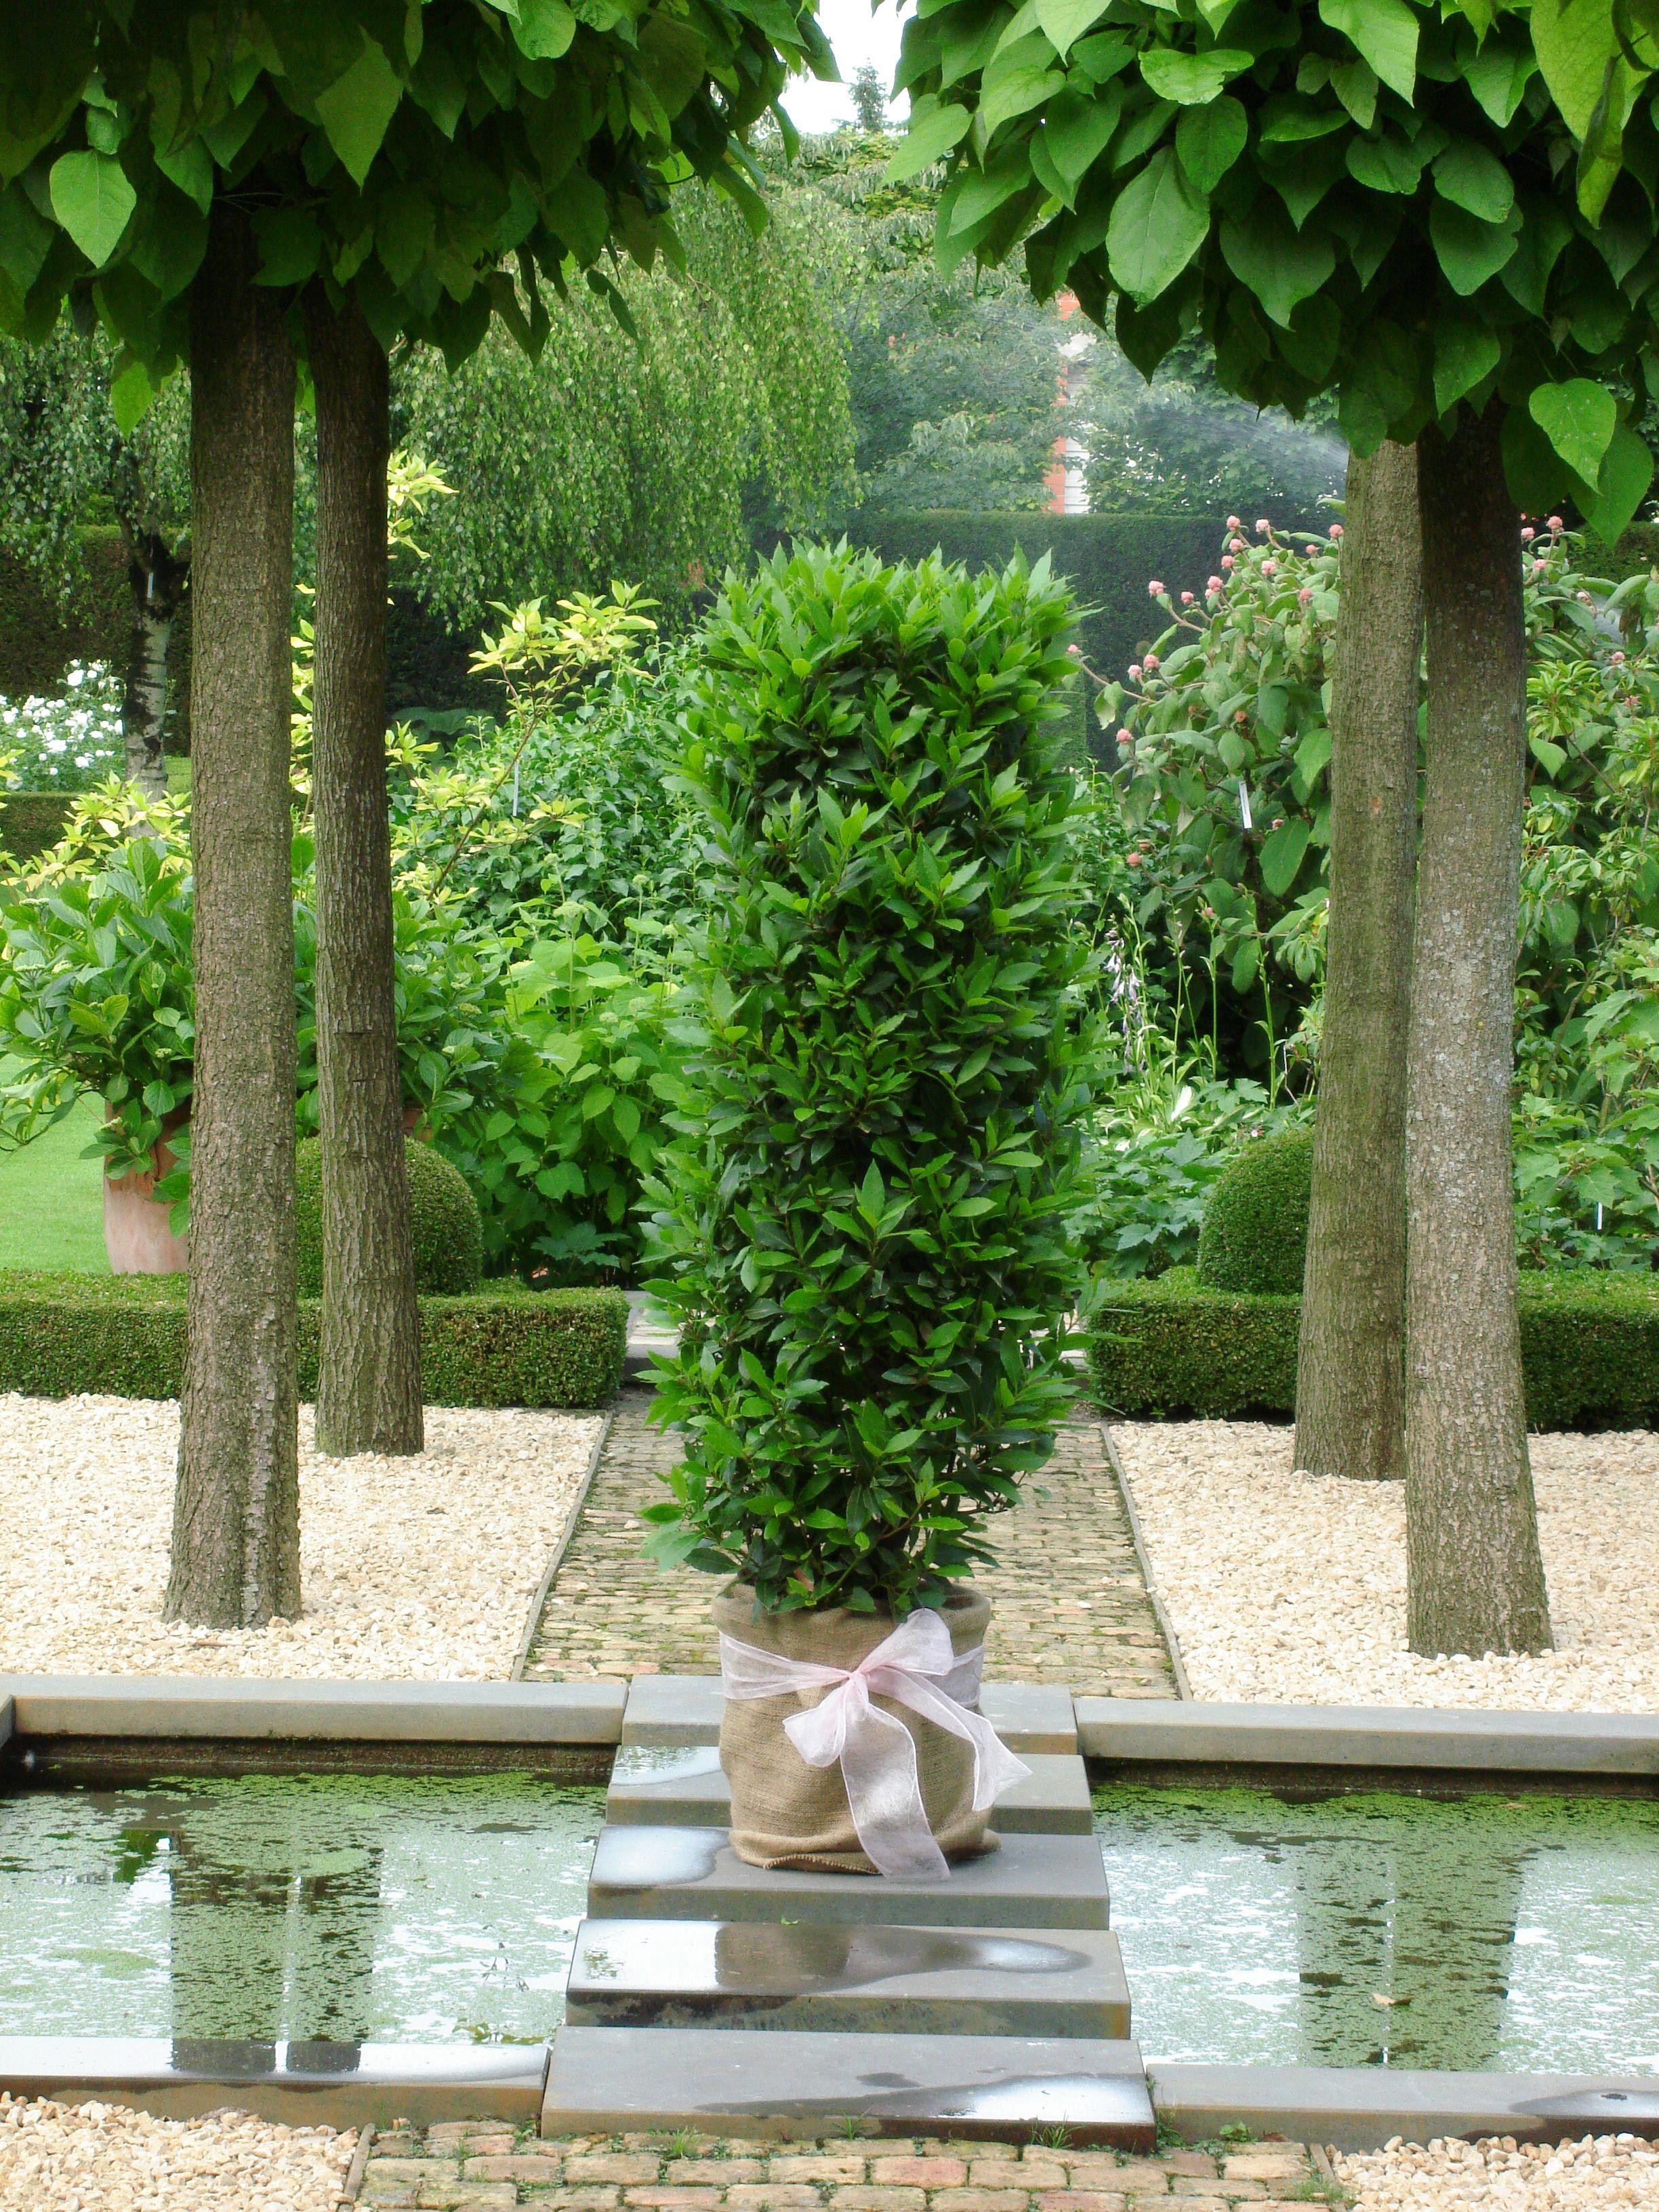 Resultado de imagen de stylish gardens | ideas jardin | Pinterest ...